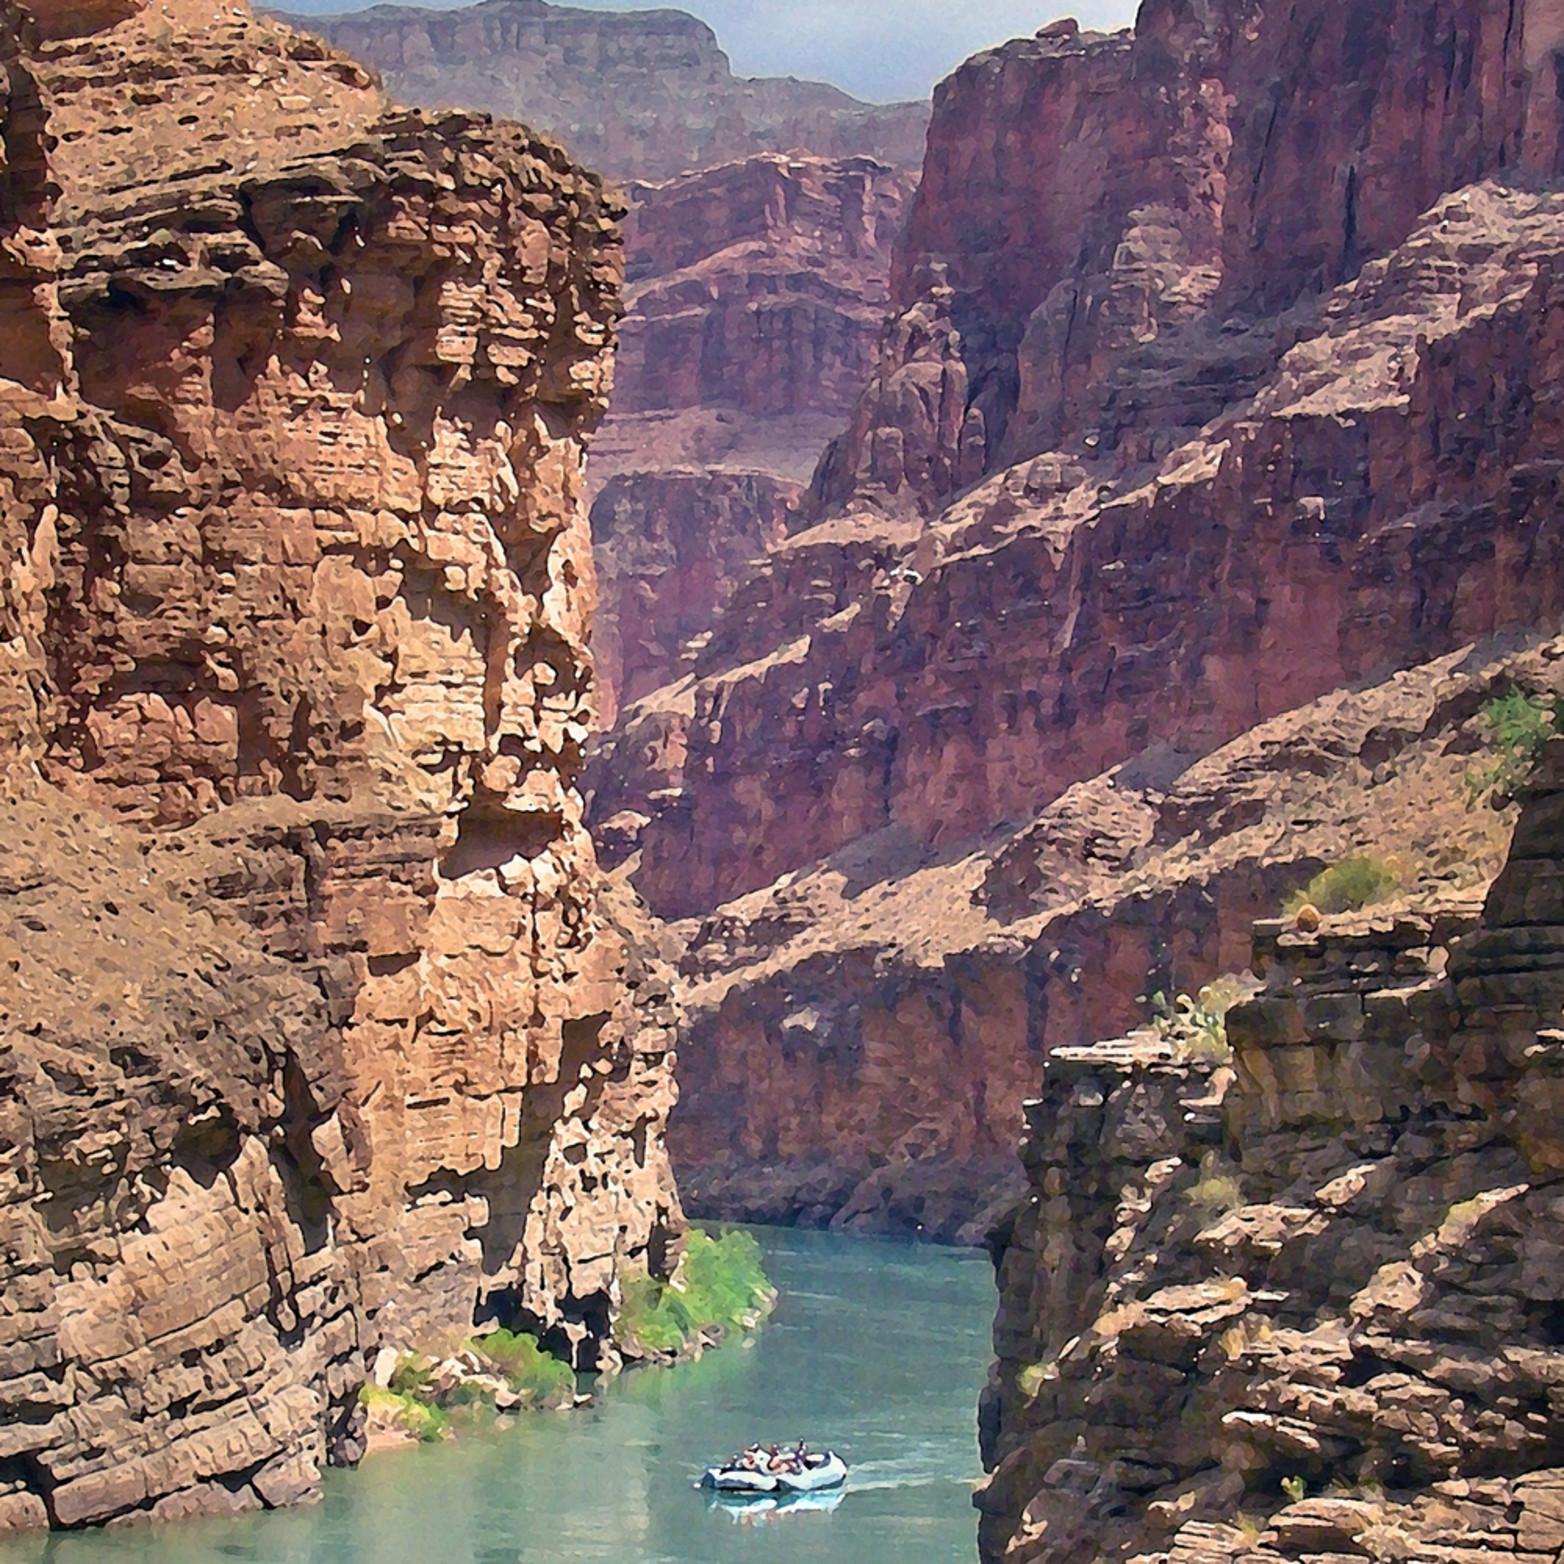 Calm waters grand canyon iuku8m